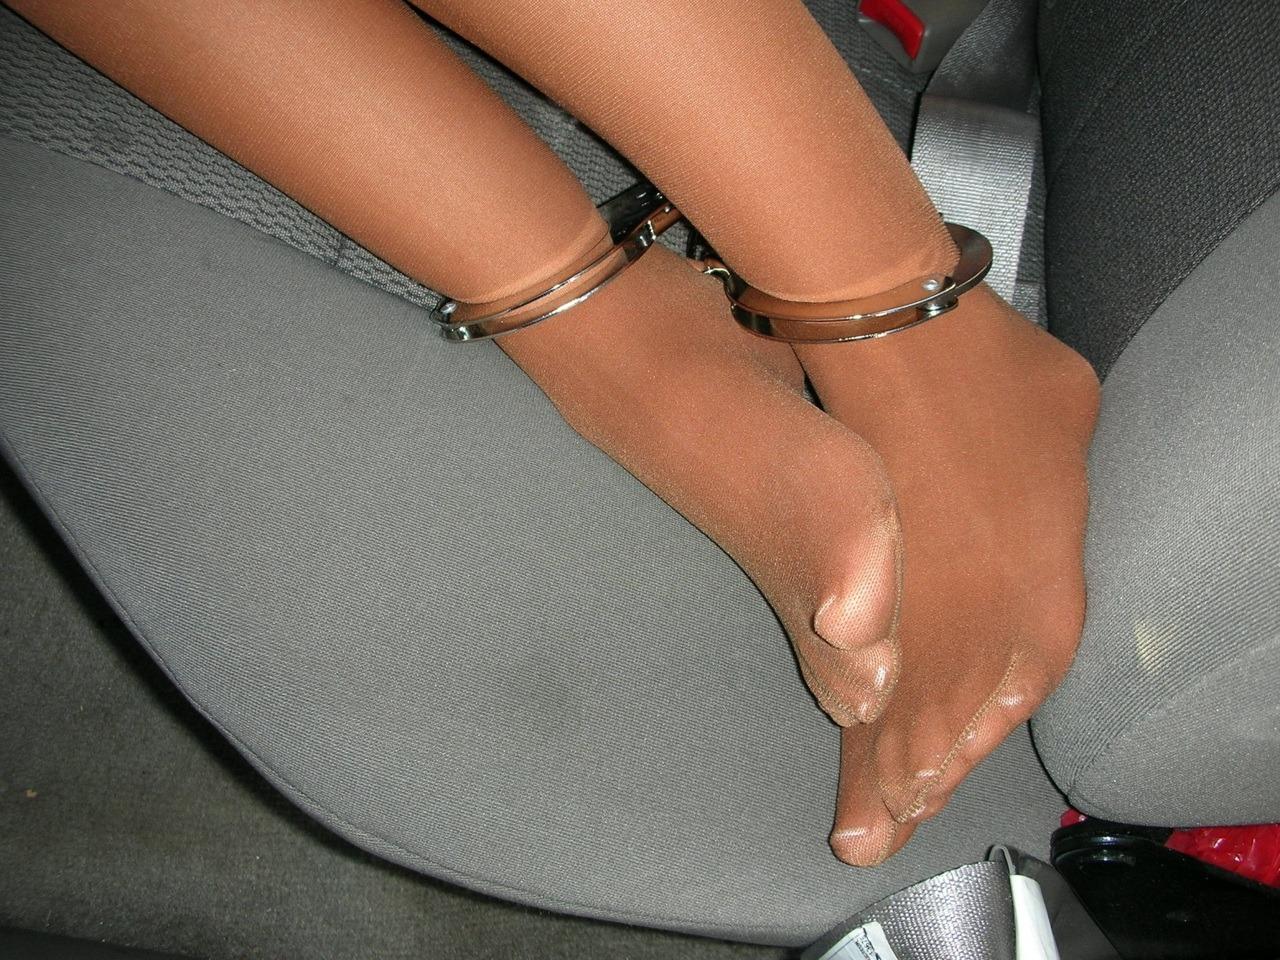 waitress pantyhose feet